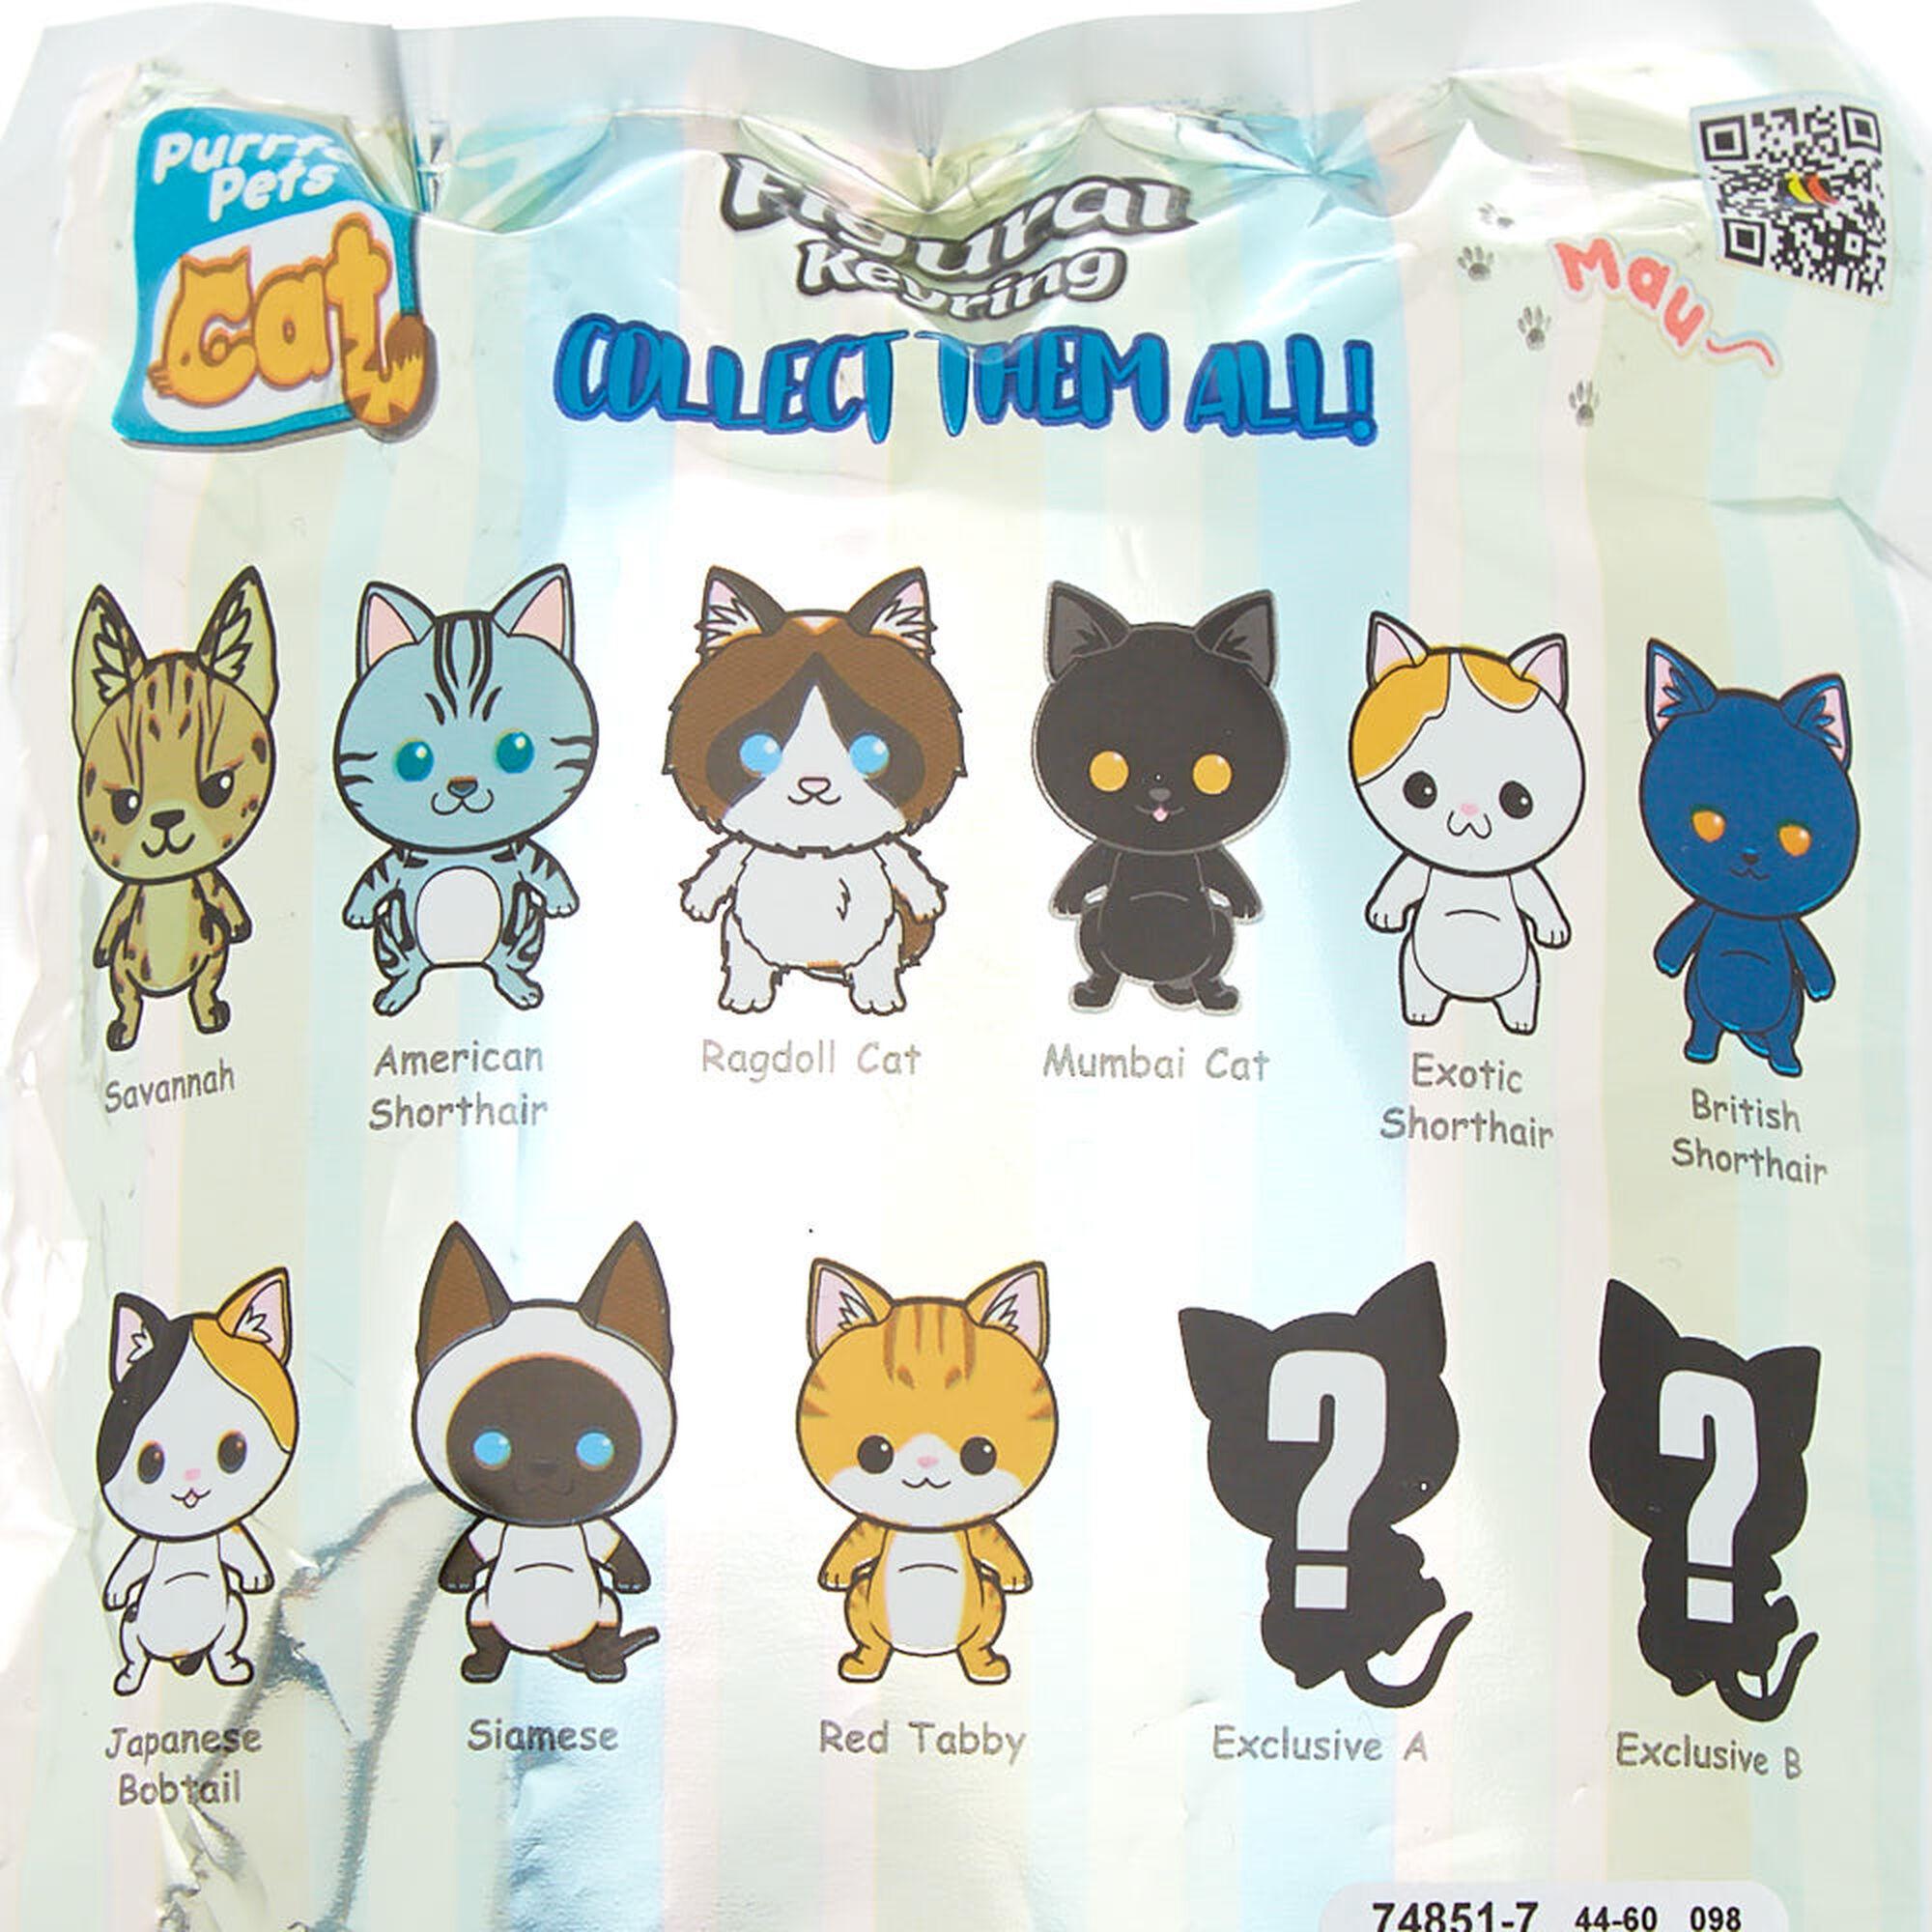 Purrfect Pets Cat Figural Key Chain Blind Bag | Claire\'s US